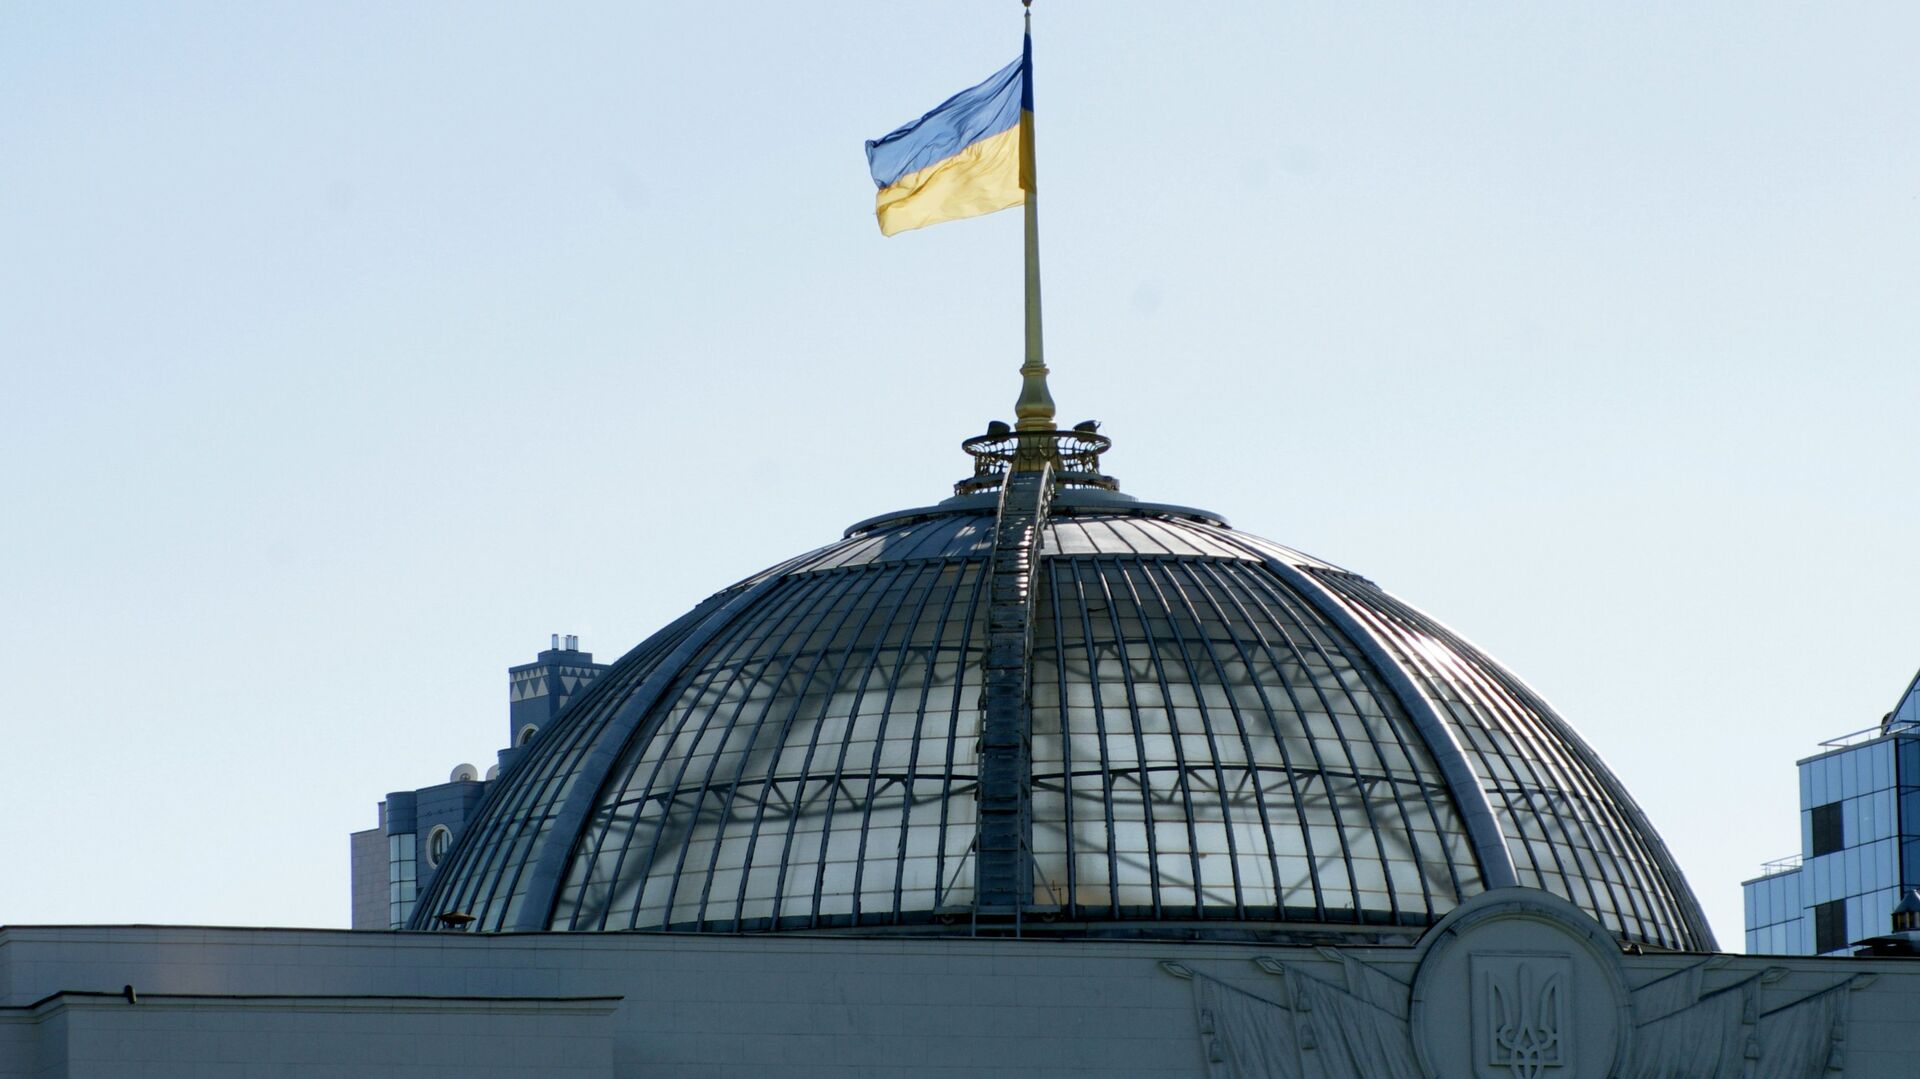 La bandera de Ucrania - Sputnik Mundo, 1920, 12.04.2021